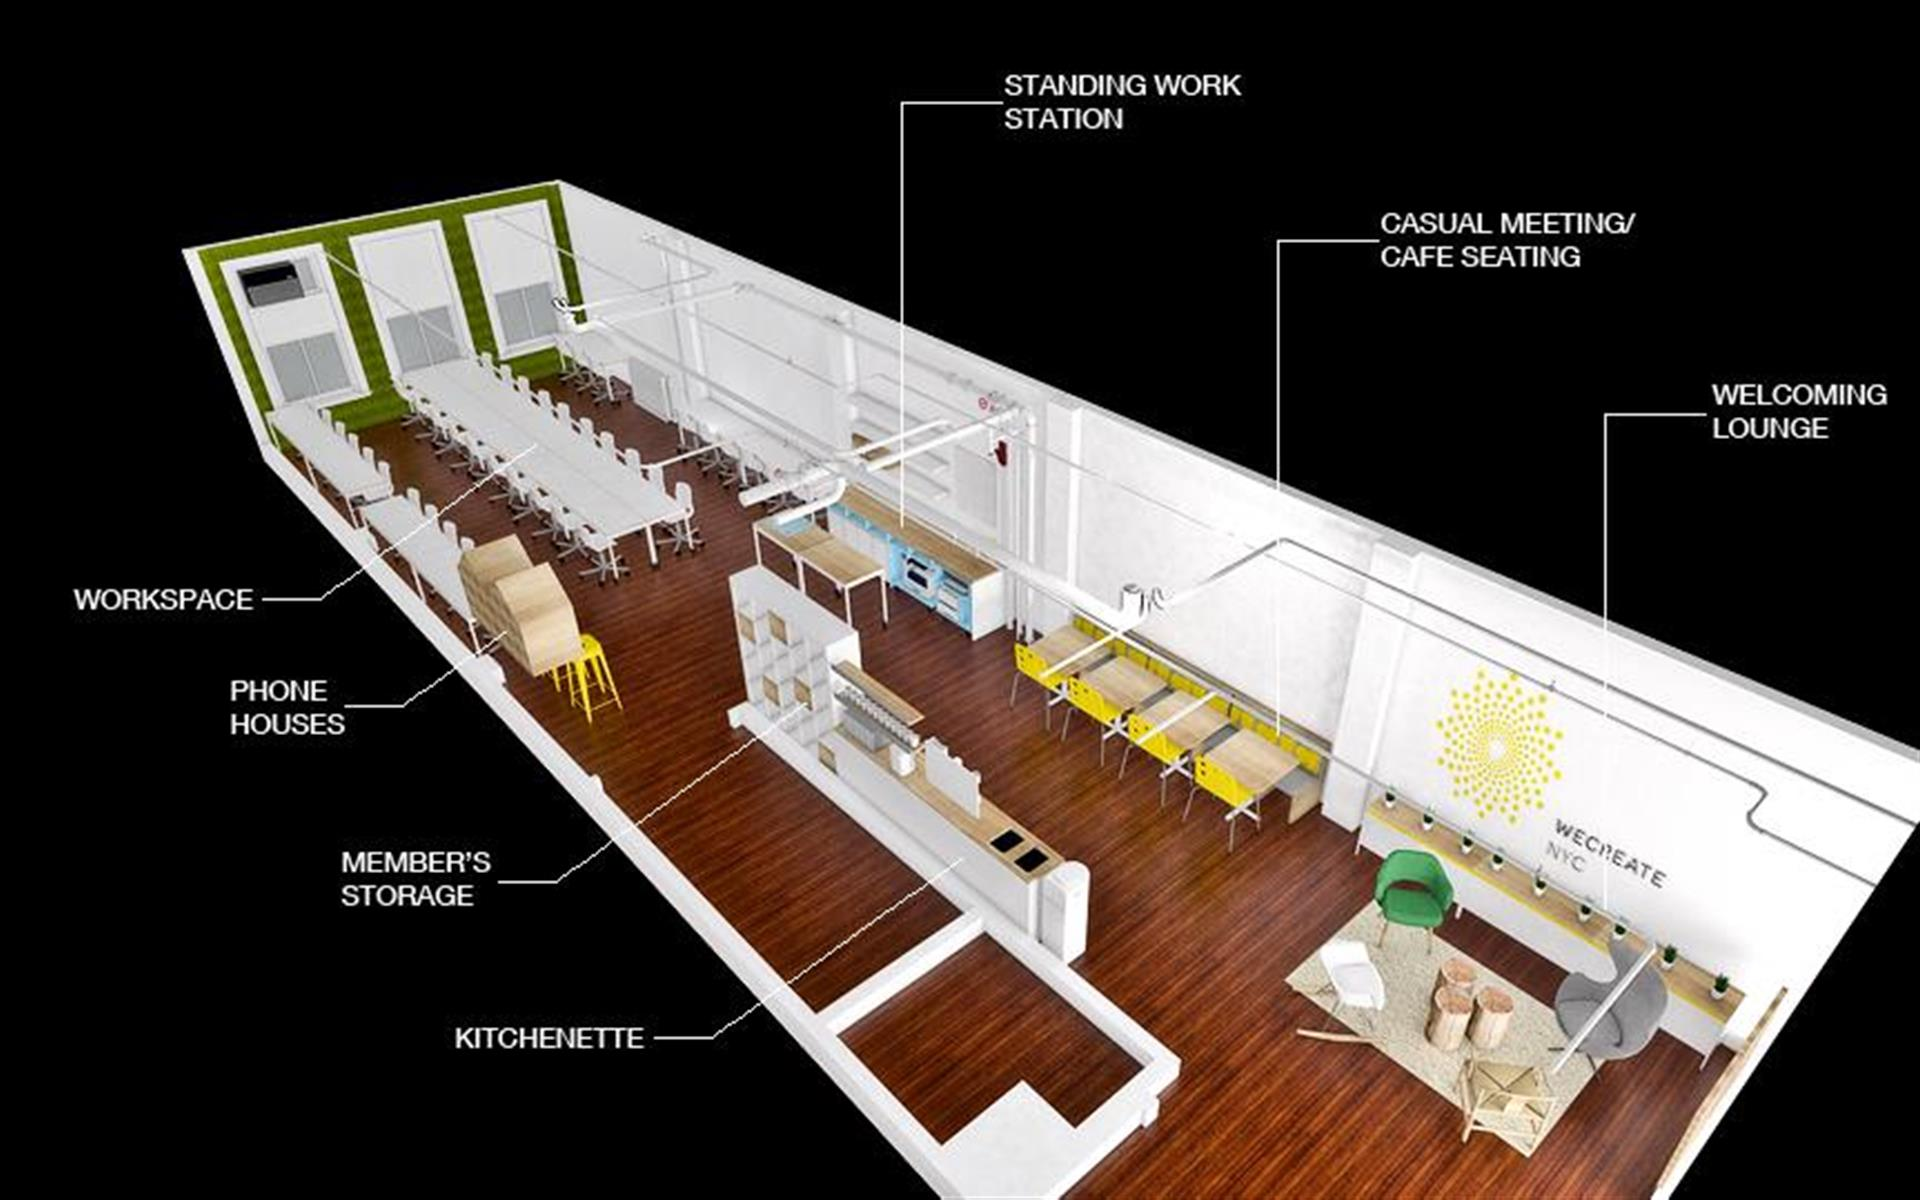 Input Lofts - Input Lofts Dedicated Desk